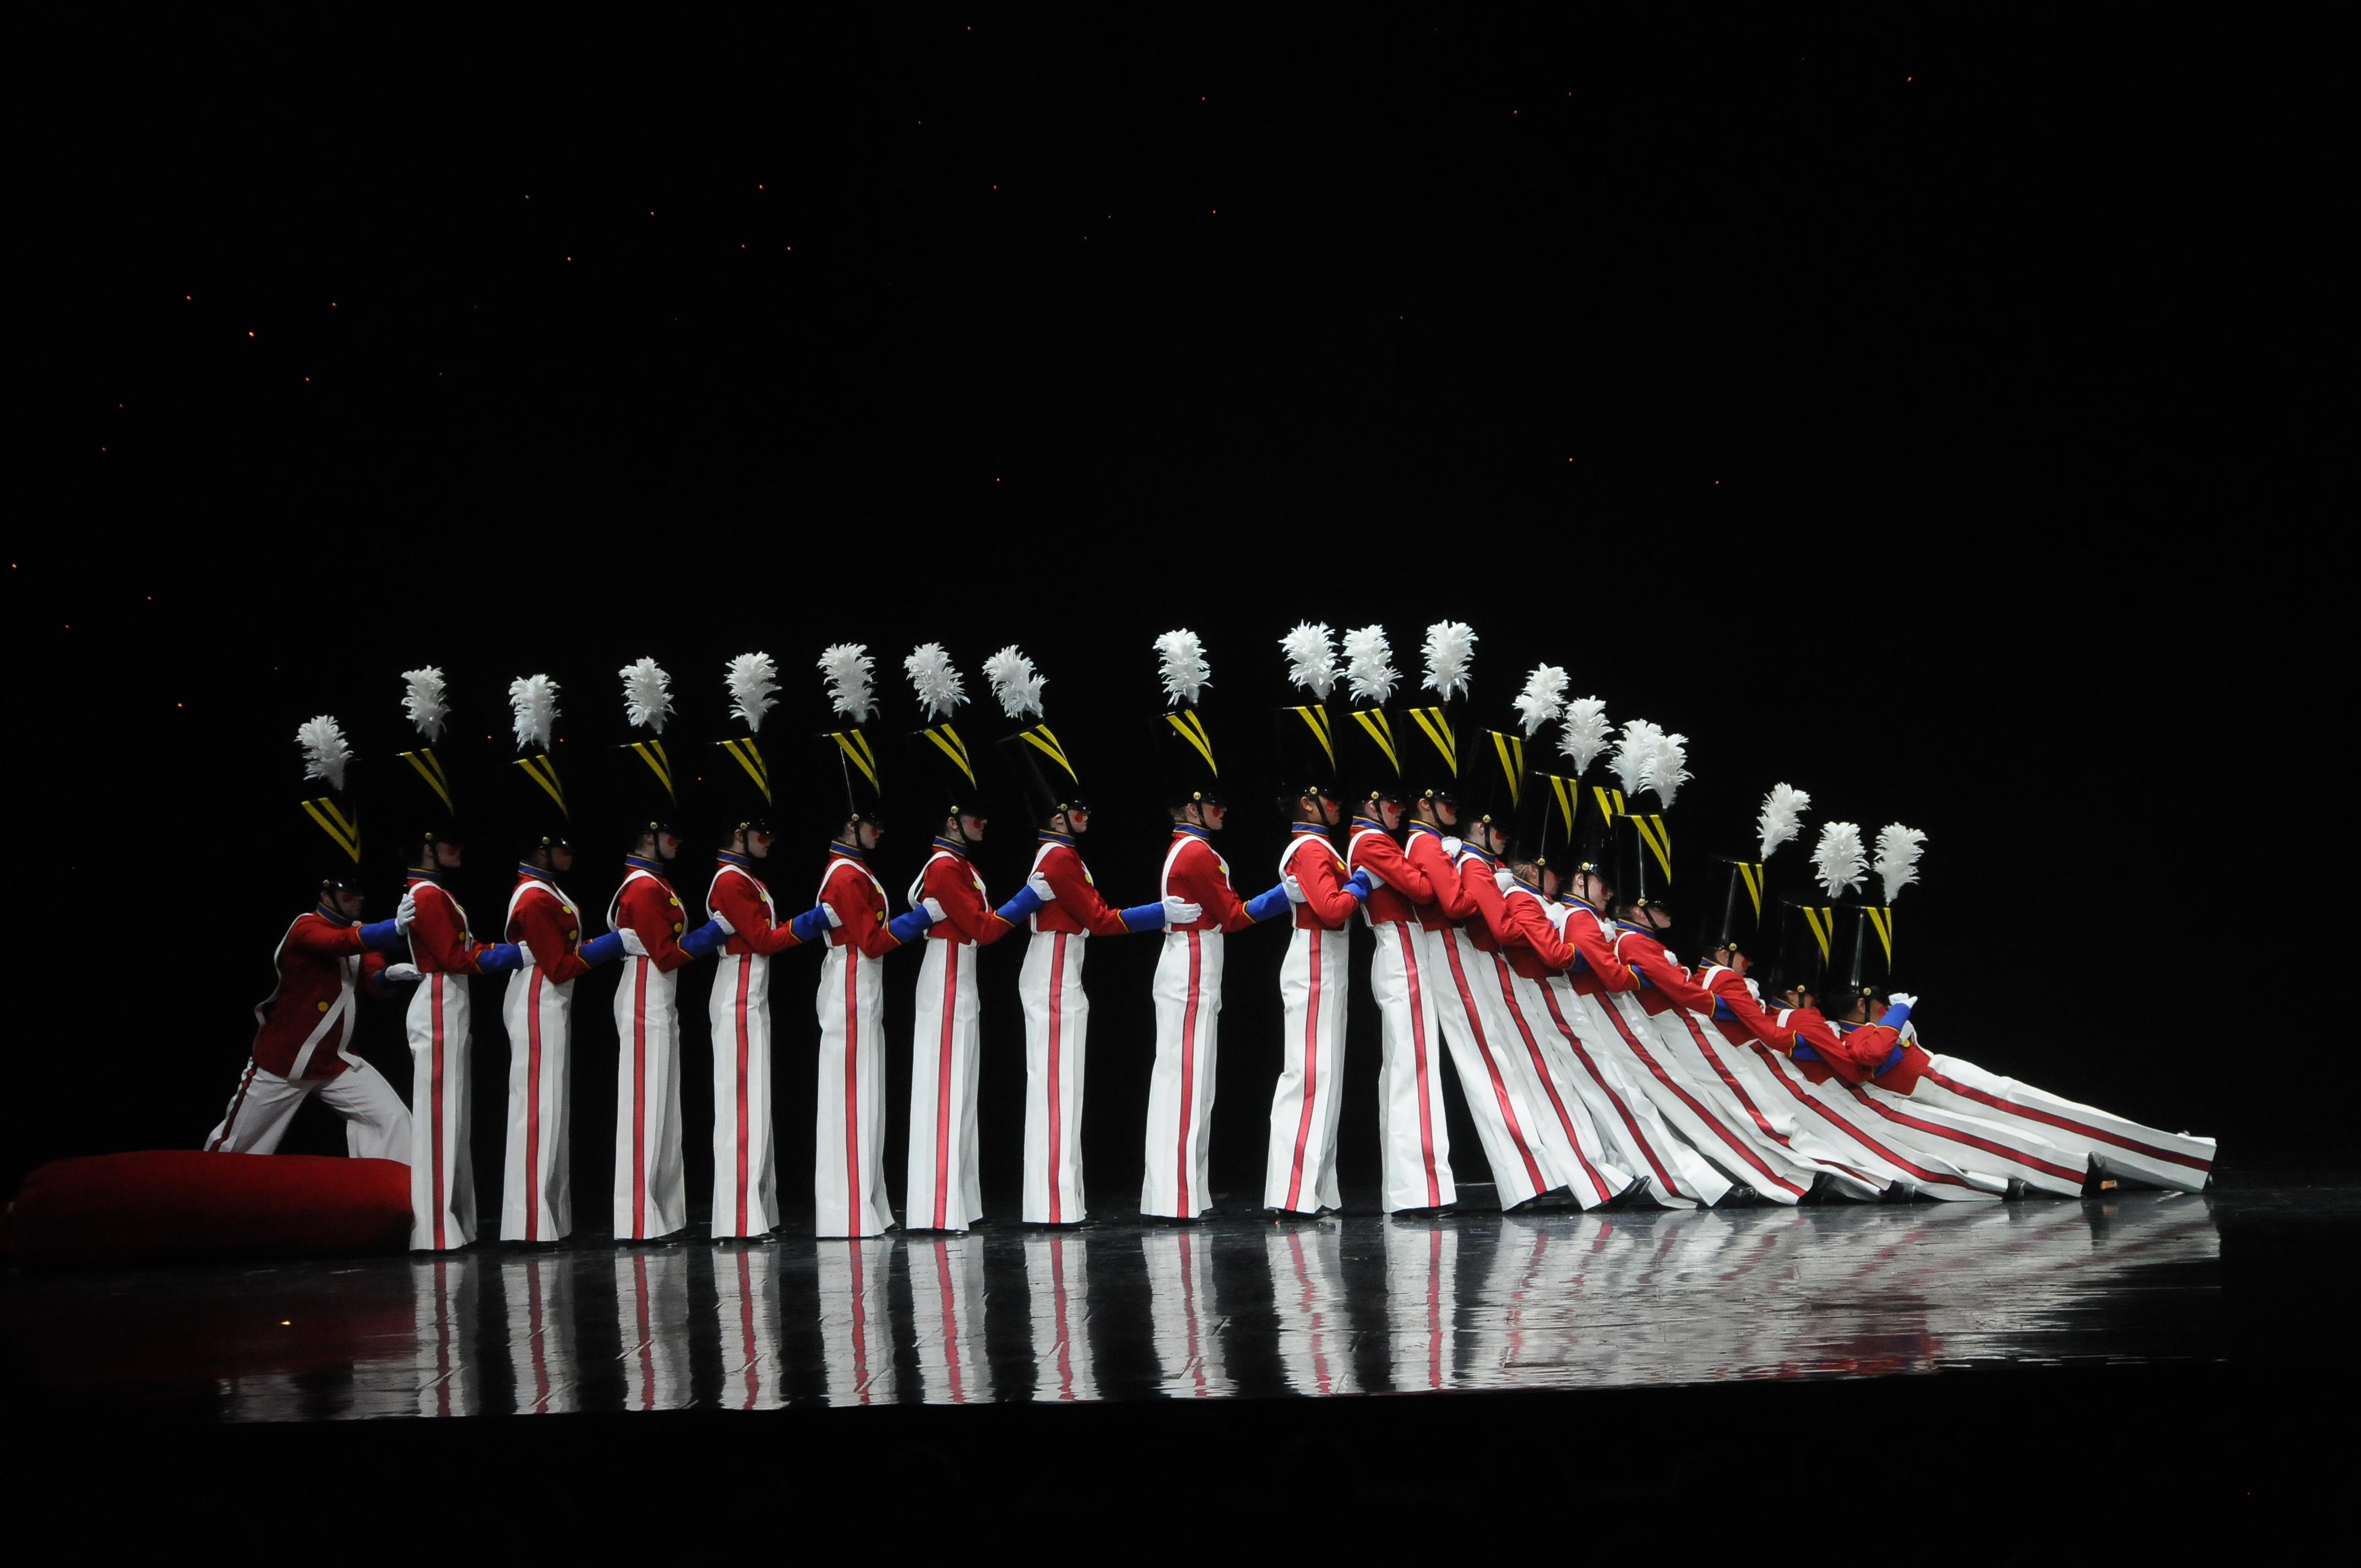 Radio City's world-famous Rockettes put on their iconic Christmas show © 2016 Karen Rubin/goingplacesfarandnear.com